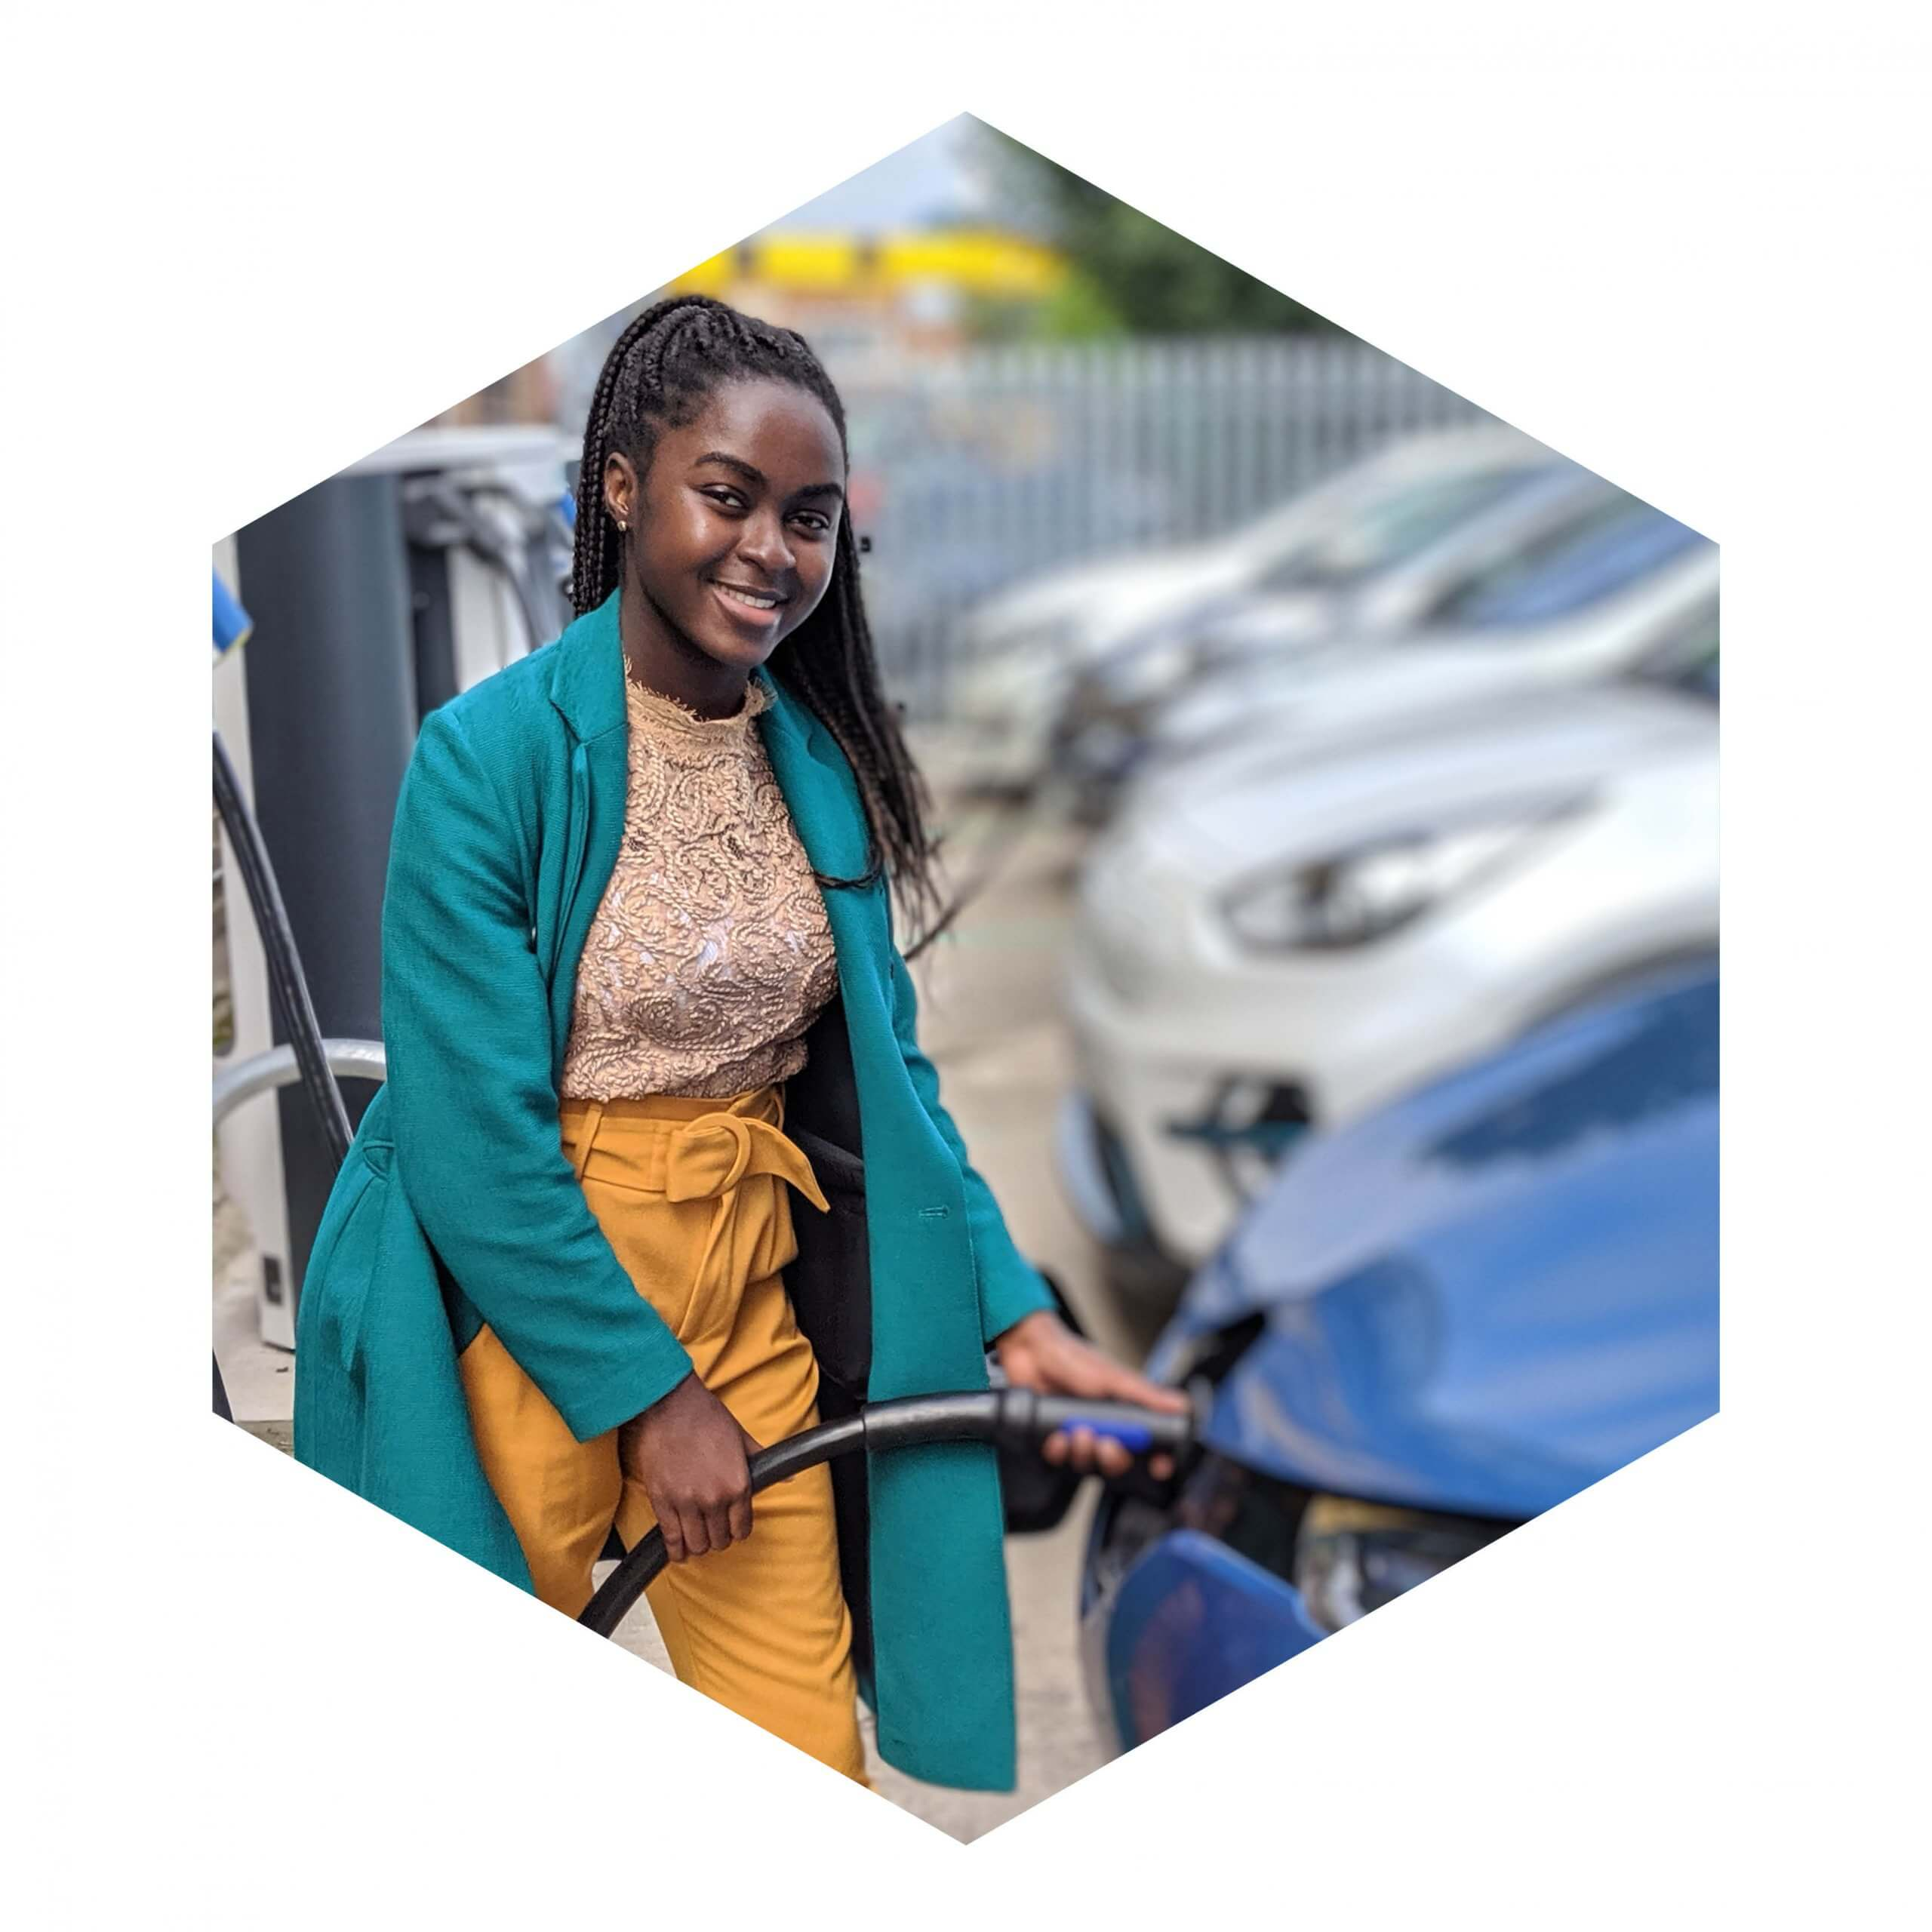 Enhancing electric transport options